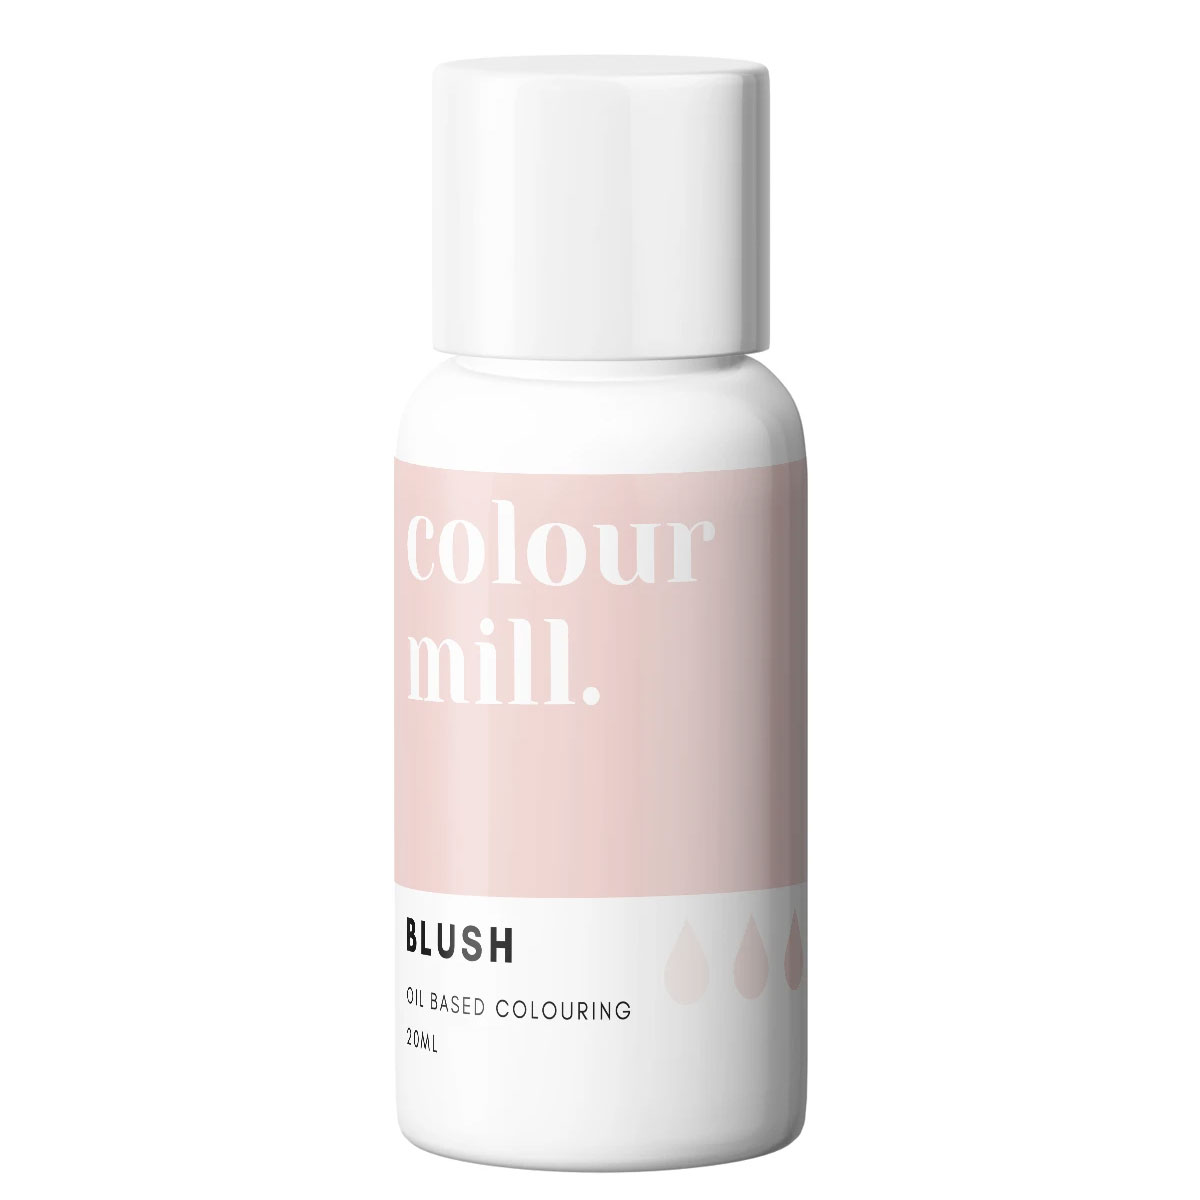 Colour Mill fettlösliche Lebensmittelfarbe - Blush 20ml